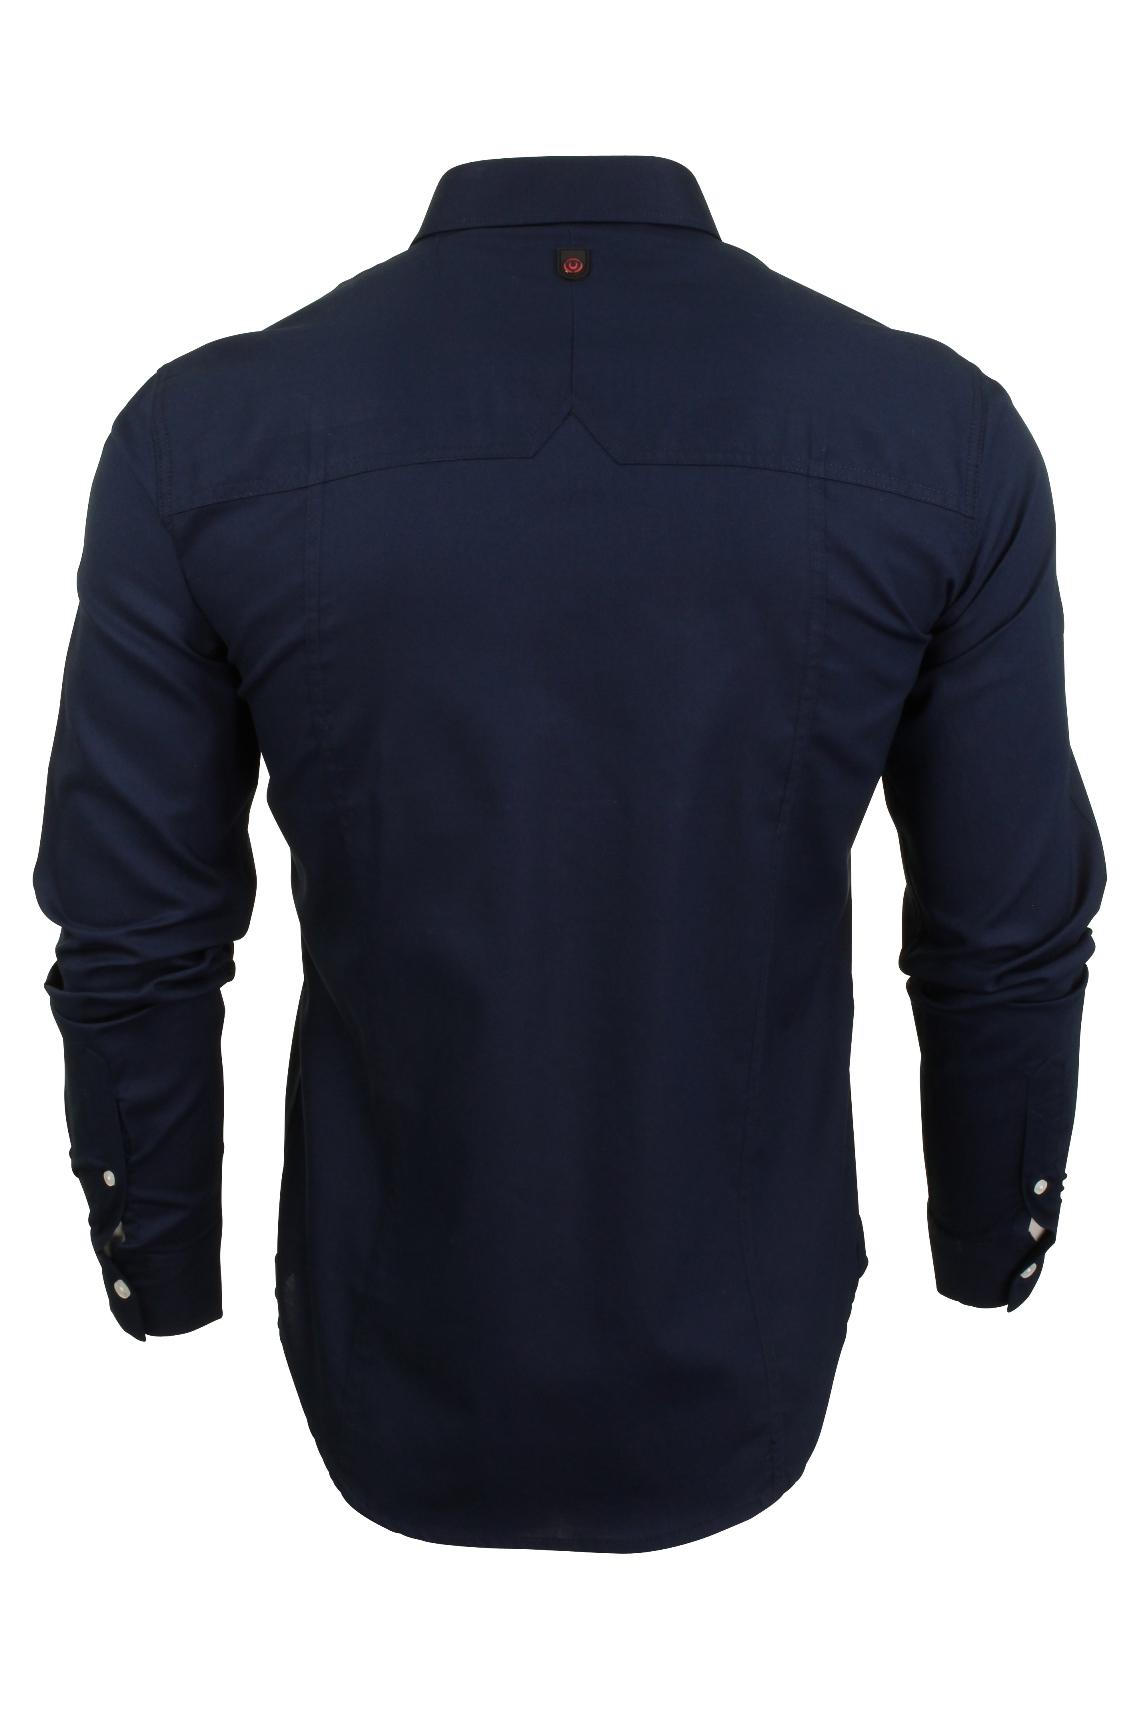 Para-hombres-camisa-de-manga-larga-por-Pato-Y-Cubierta-039-abedul-039 miniatura 8